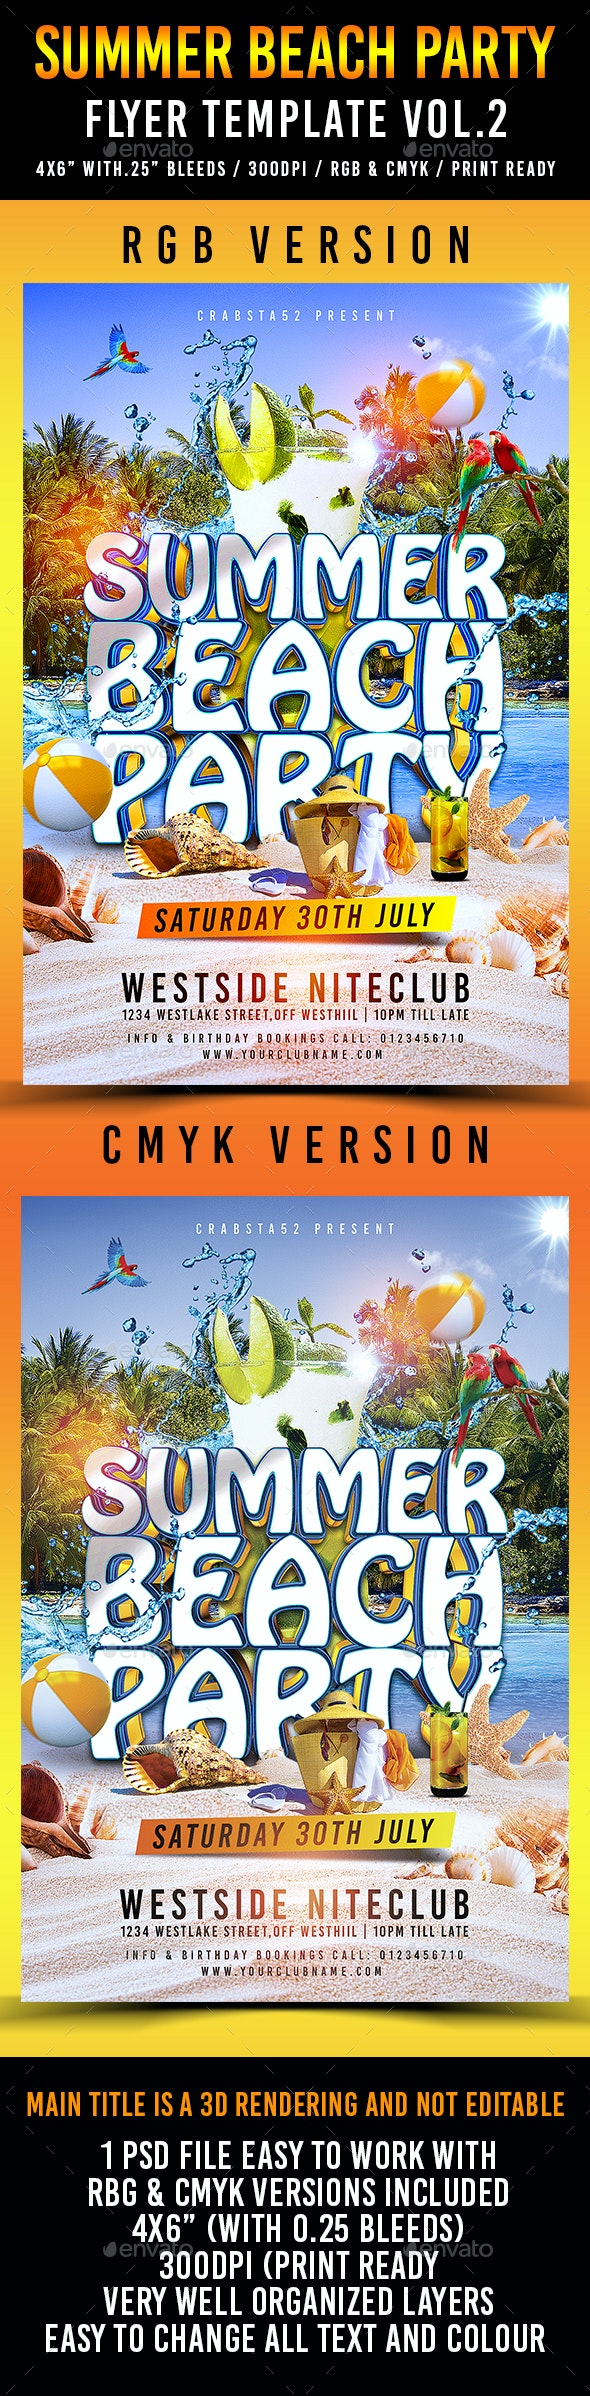 Summer Beach Party Flyer Template Vol.2 - Flyers Print Templates